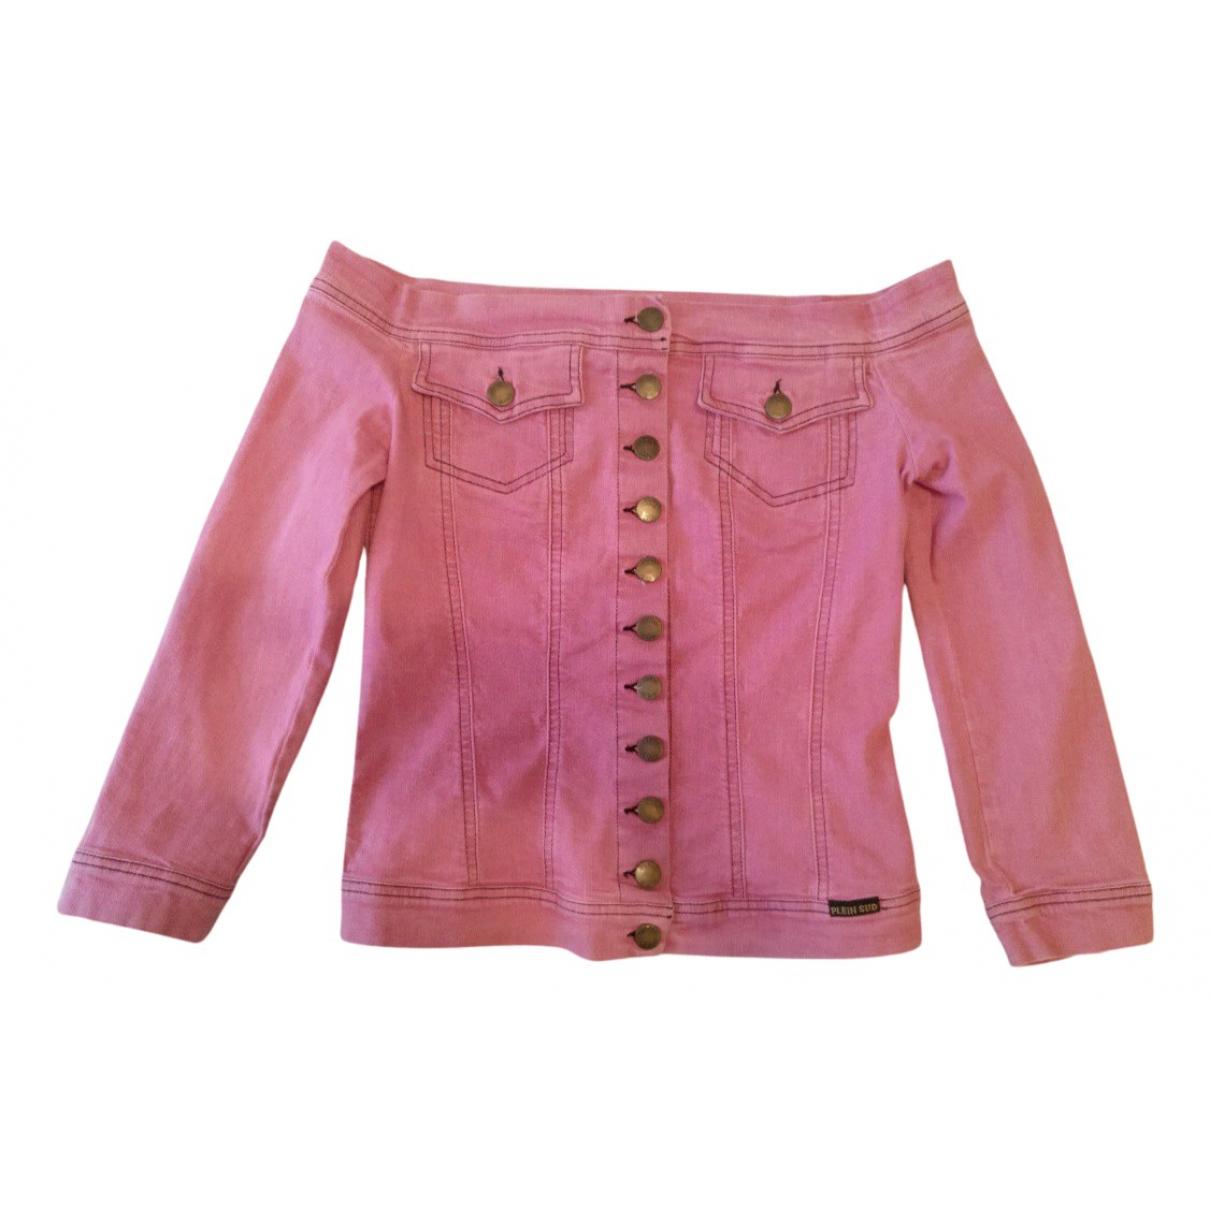 Plein Sud \N Lederjacke in  Rosa Denim - Jeans